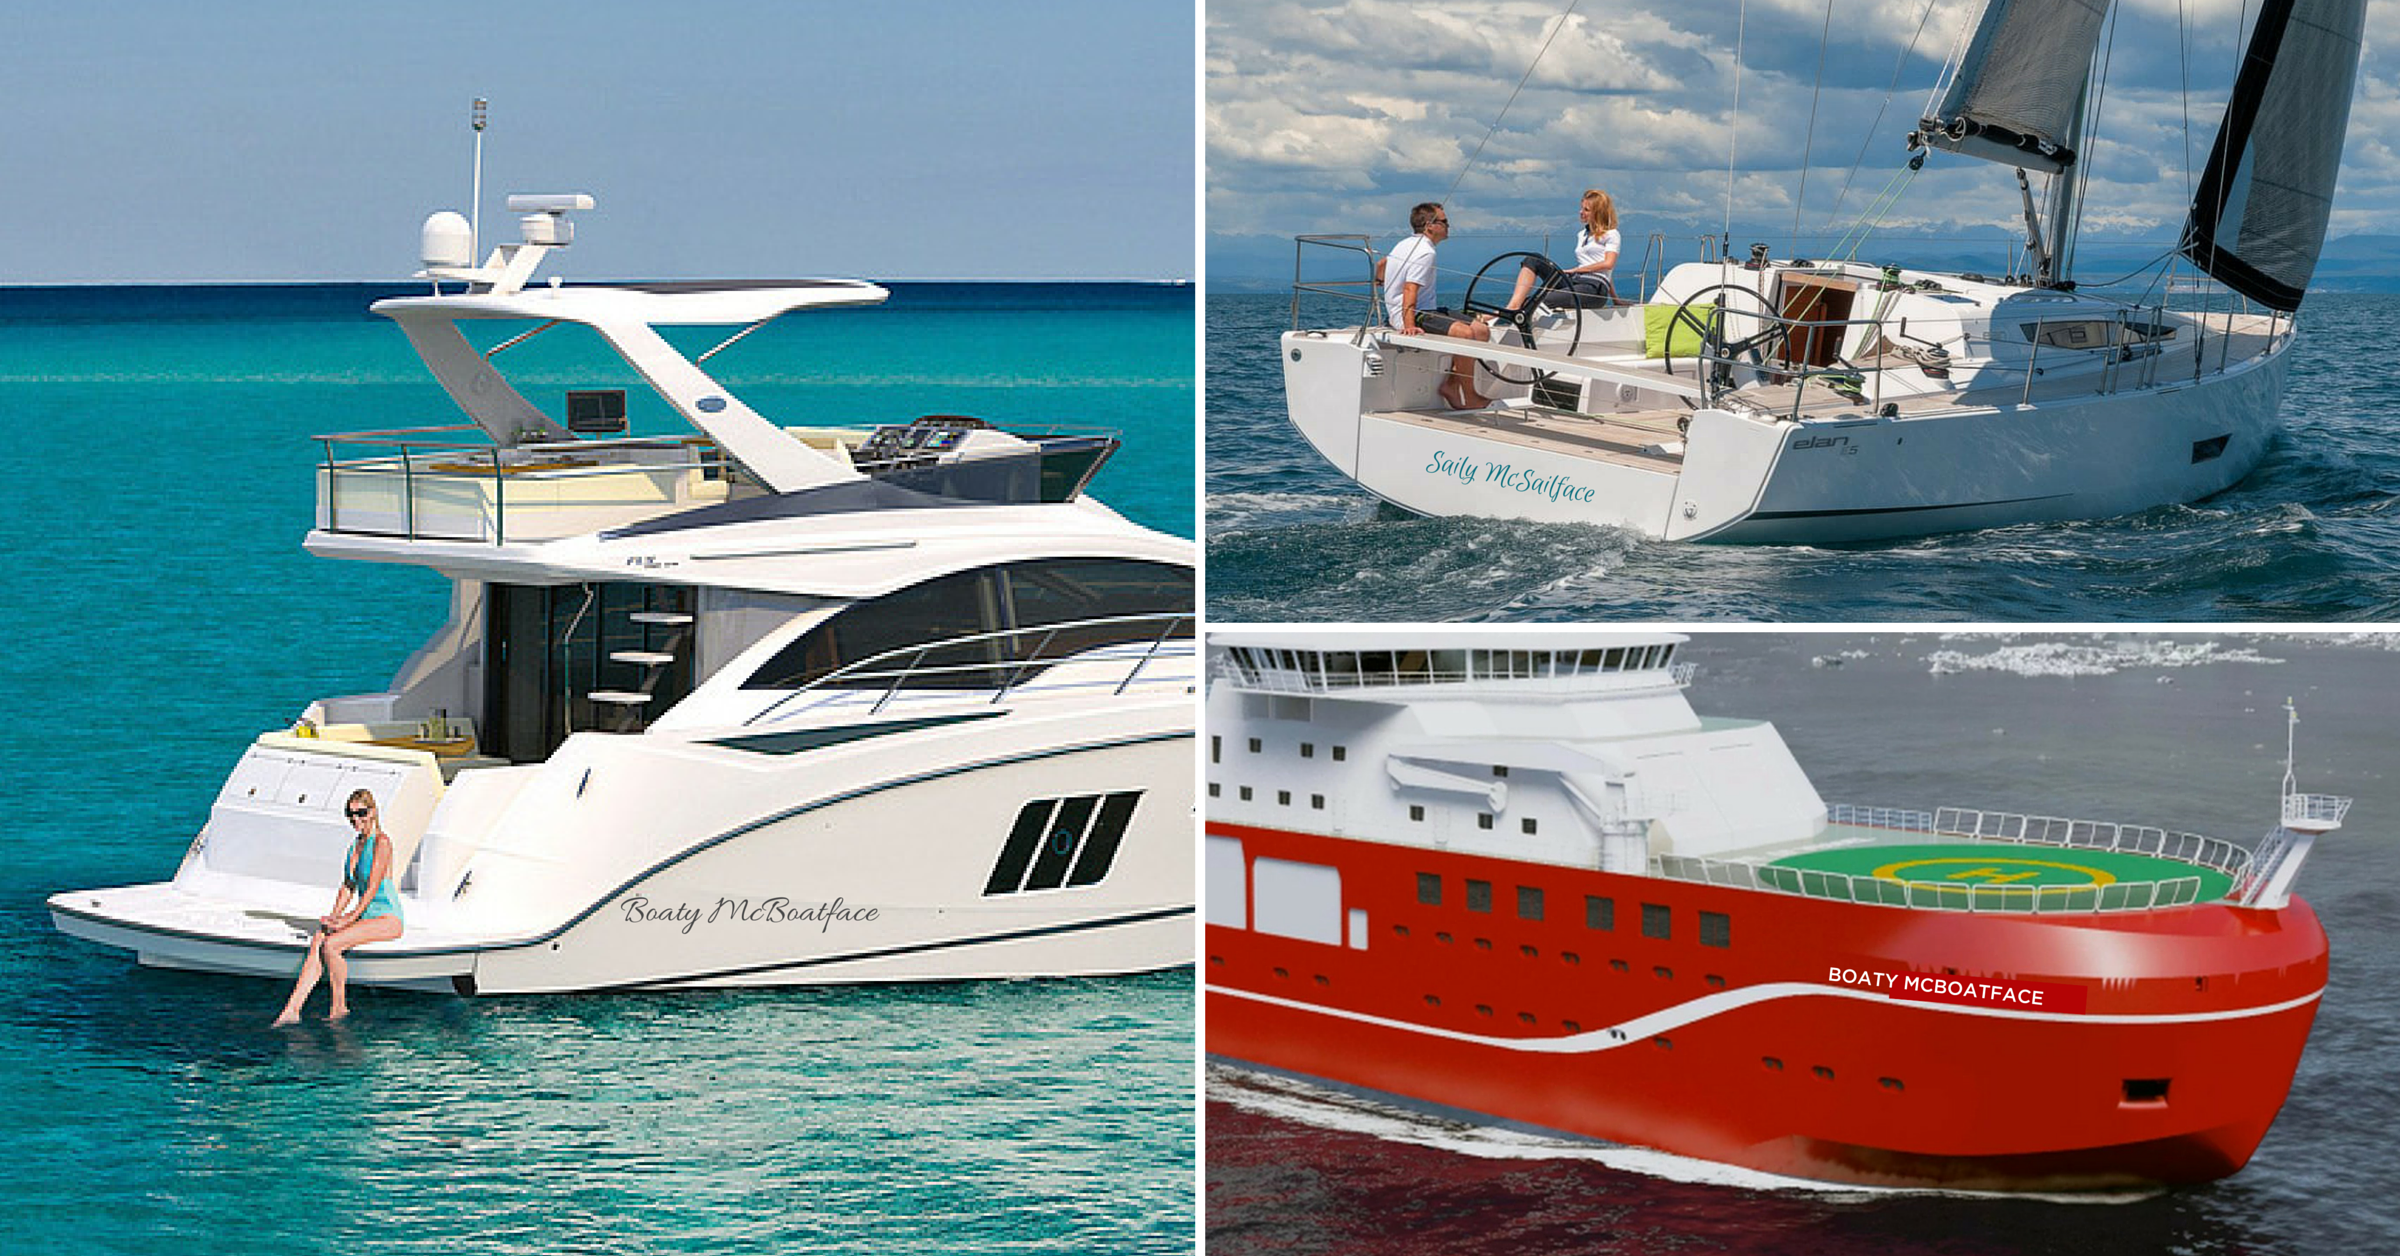 Boat Names: 12 Tacks to Take When Naming Your Boat